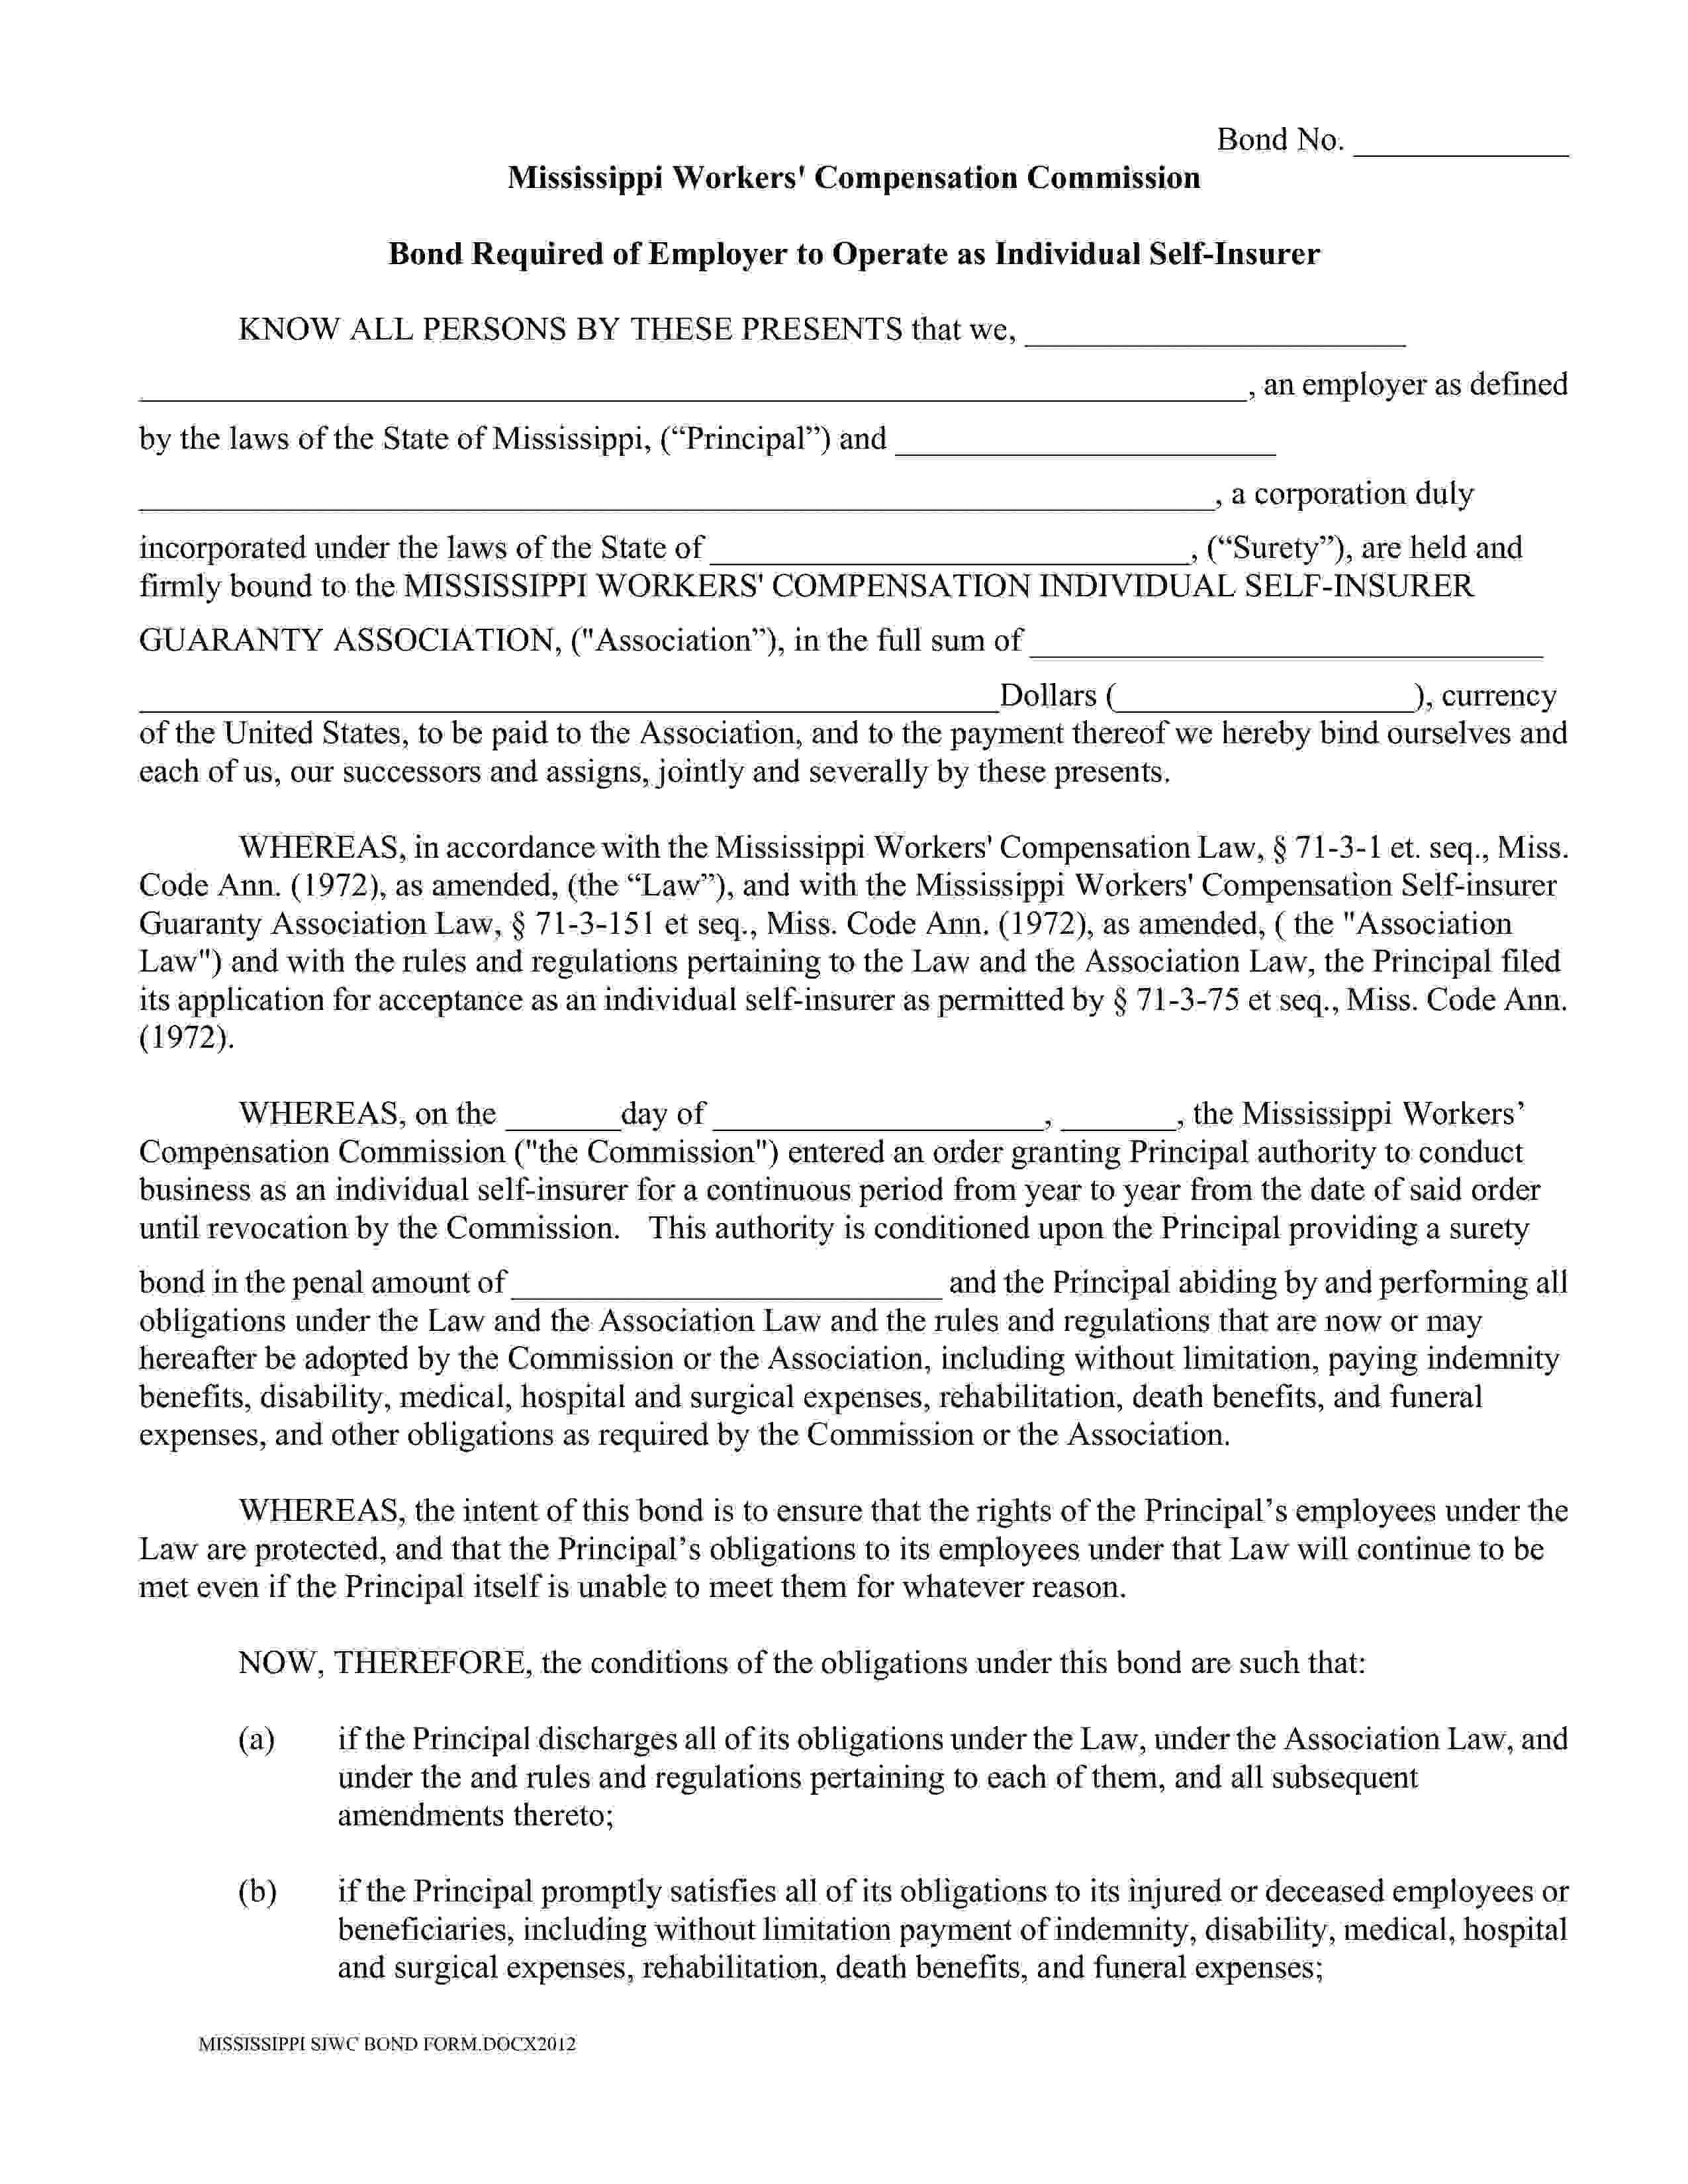 Mississippi Workers' Compensation Commission Self-Insurer of Workers Compensation Bond sample image